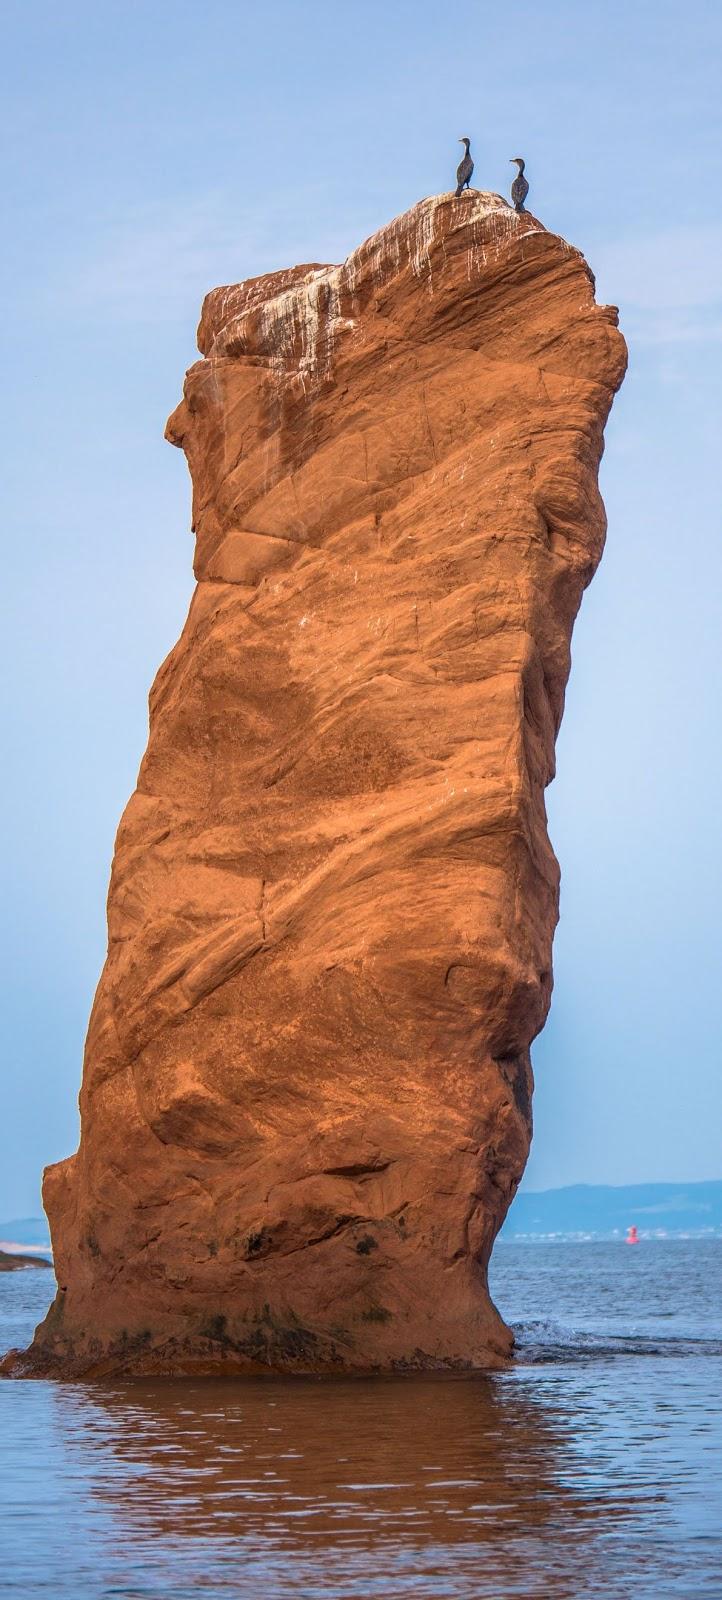 Two birds on a massive rock bolder.